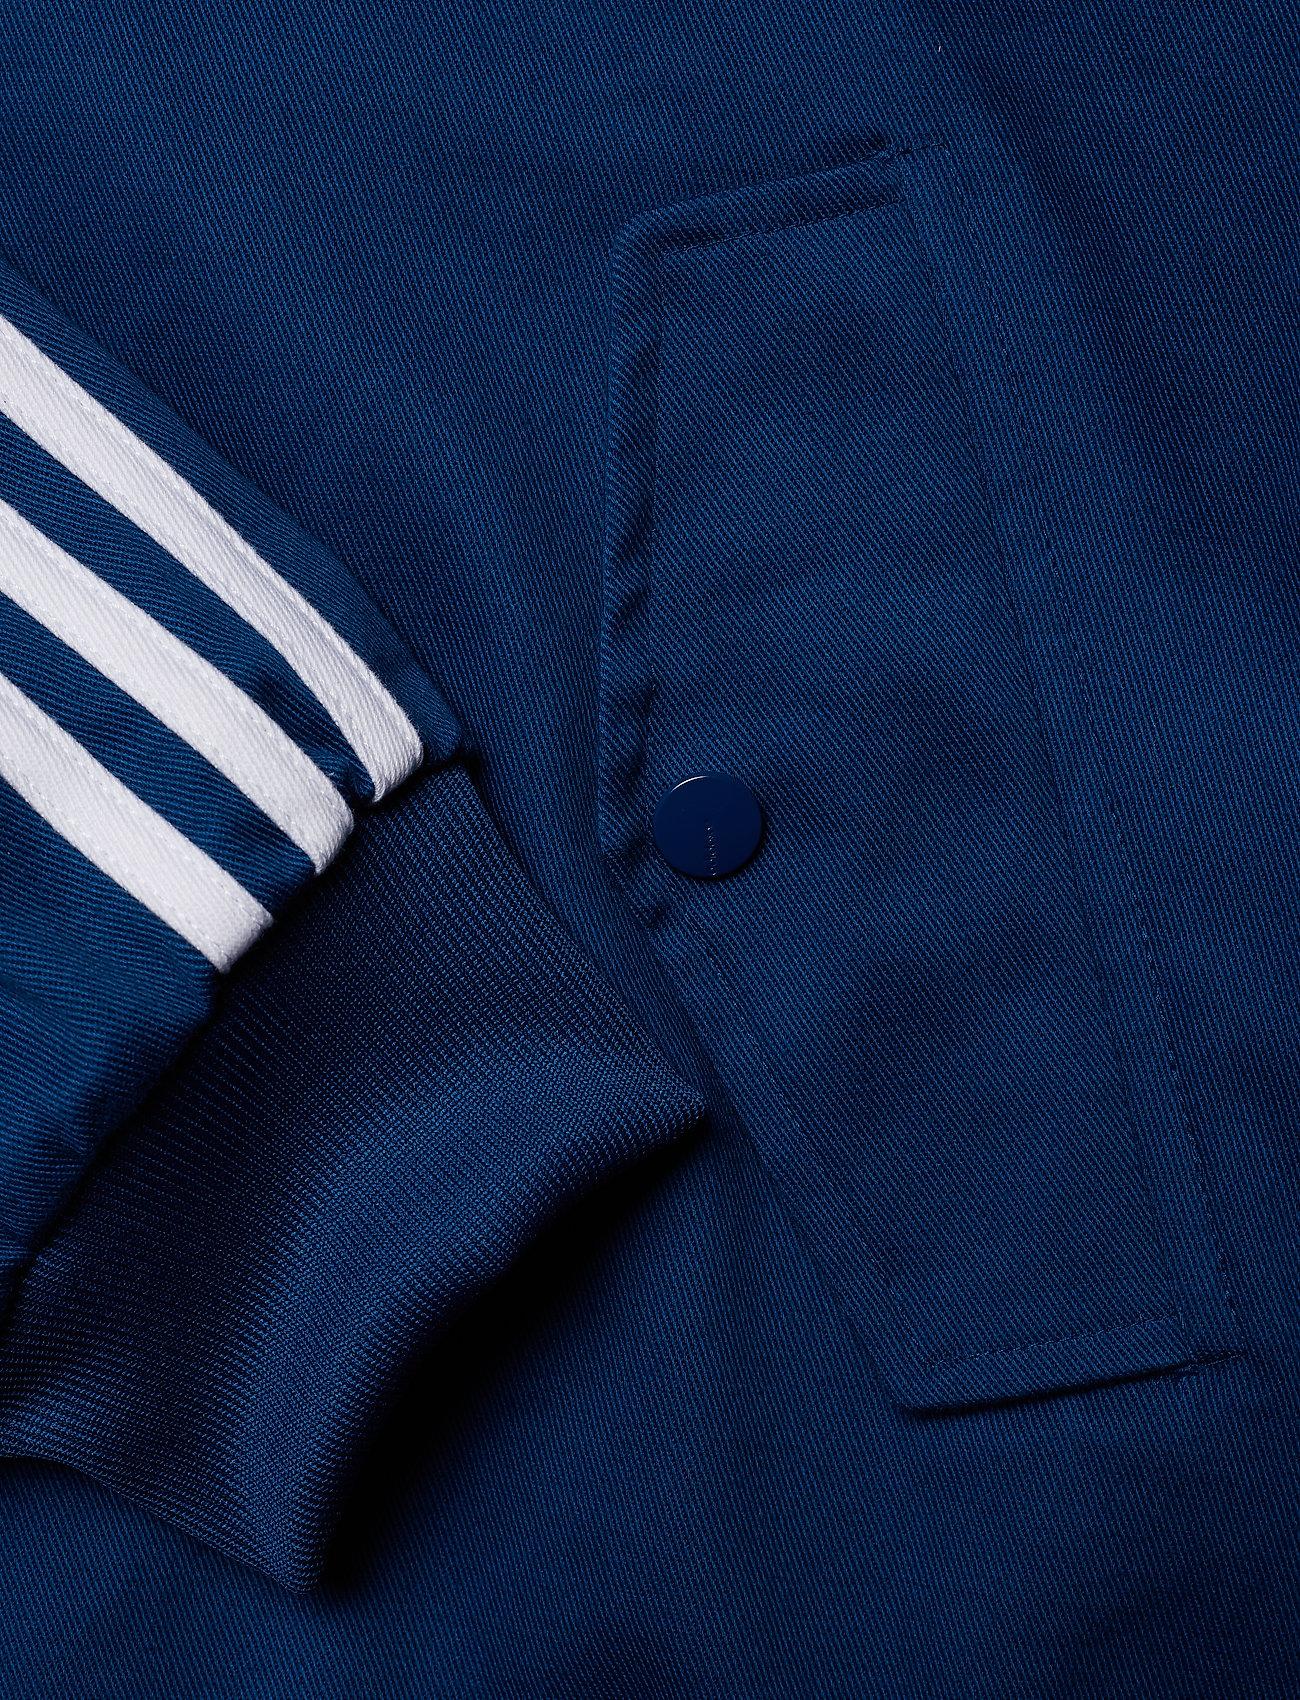 adidas Originals    CW HERRINGTON  - Jacken & Mäntel    LEGMAR/WHITE